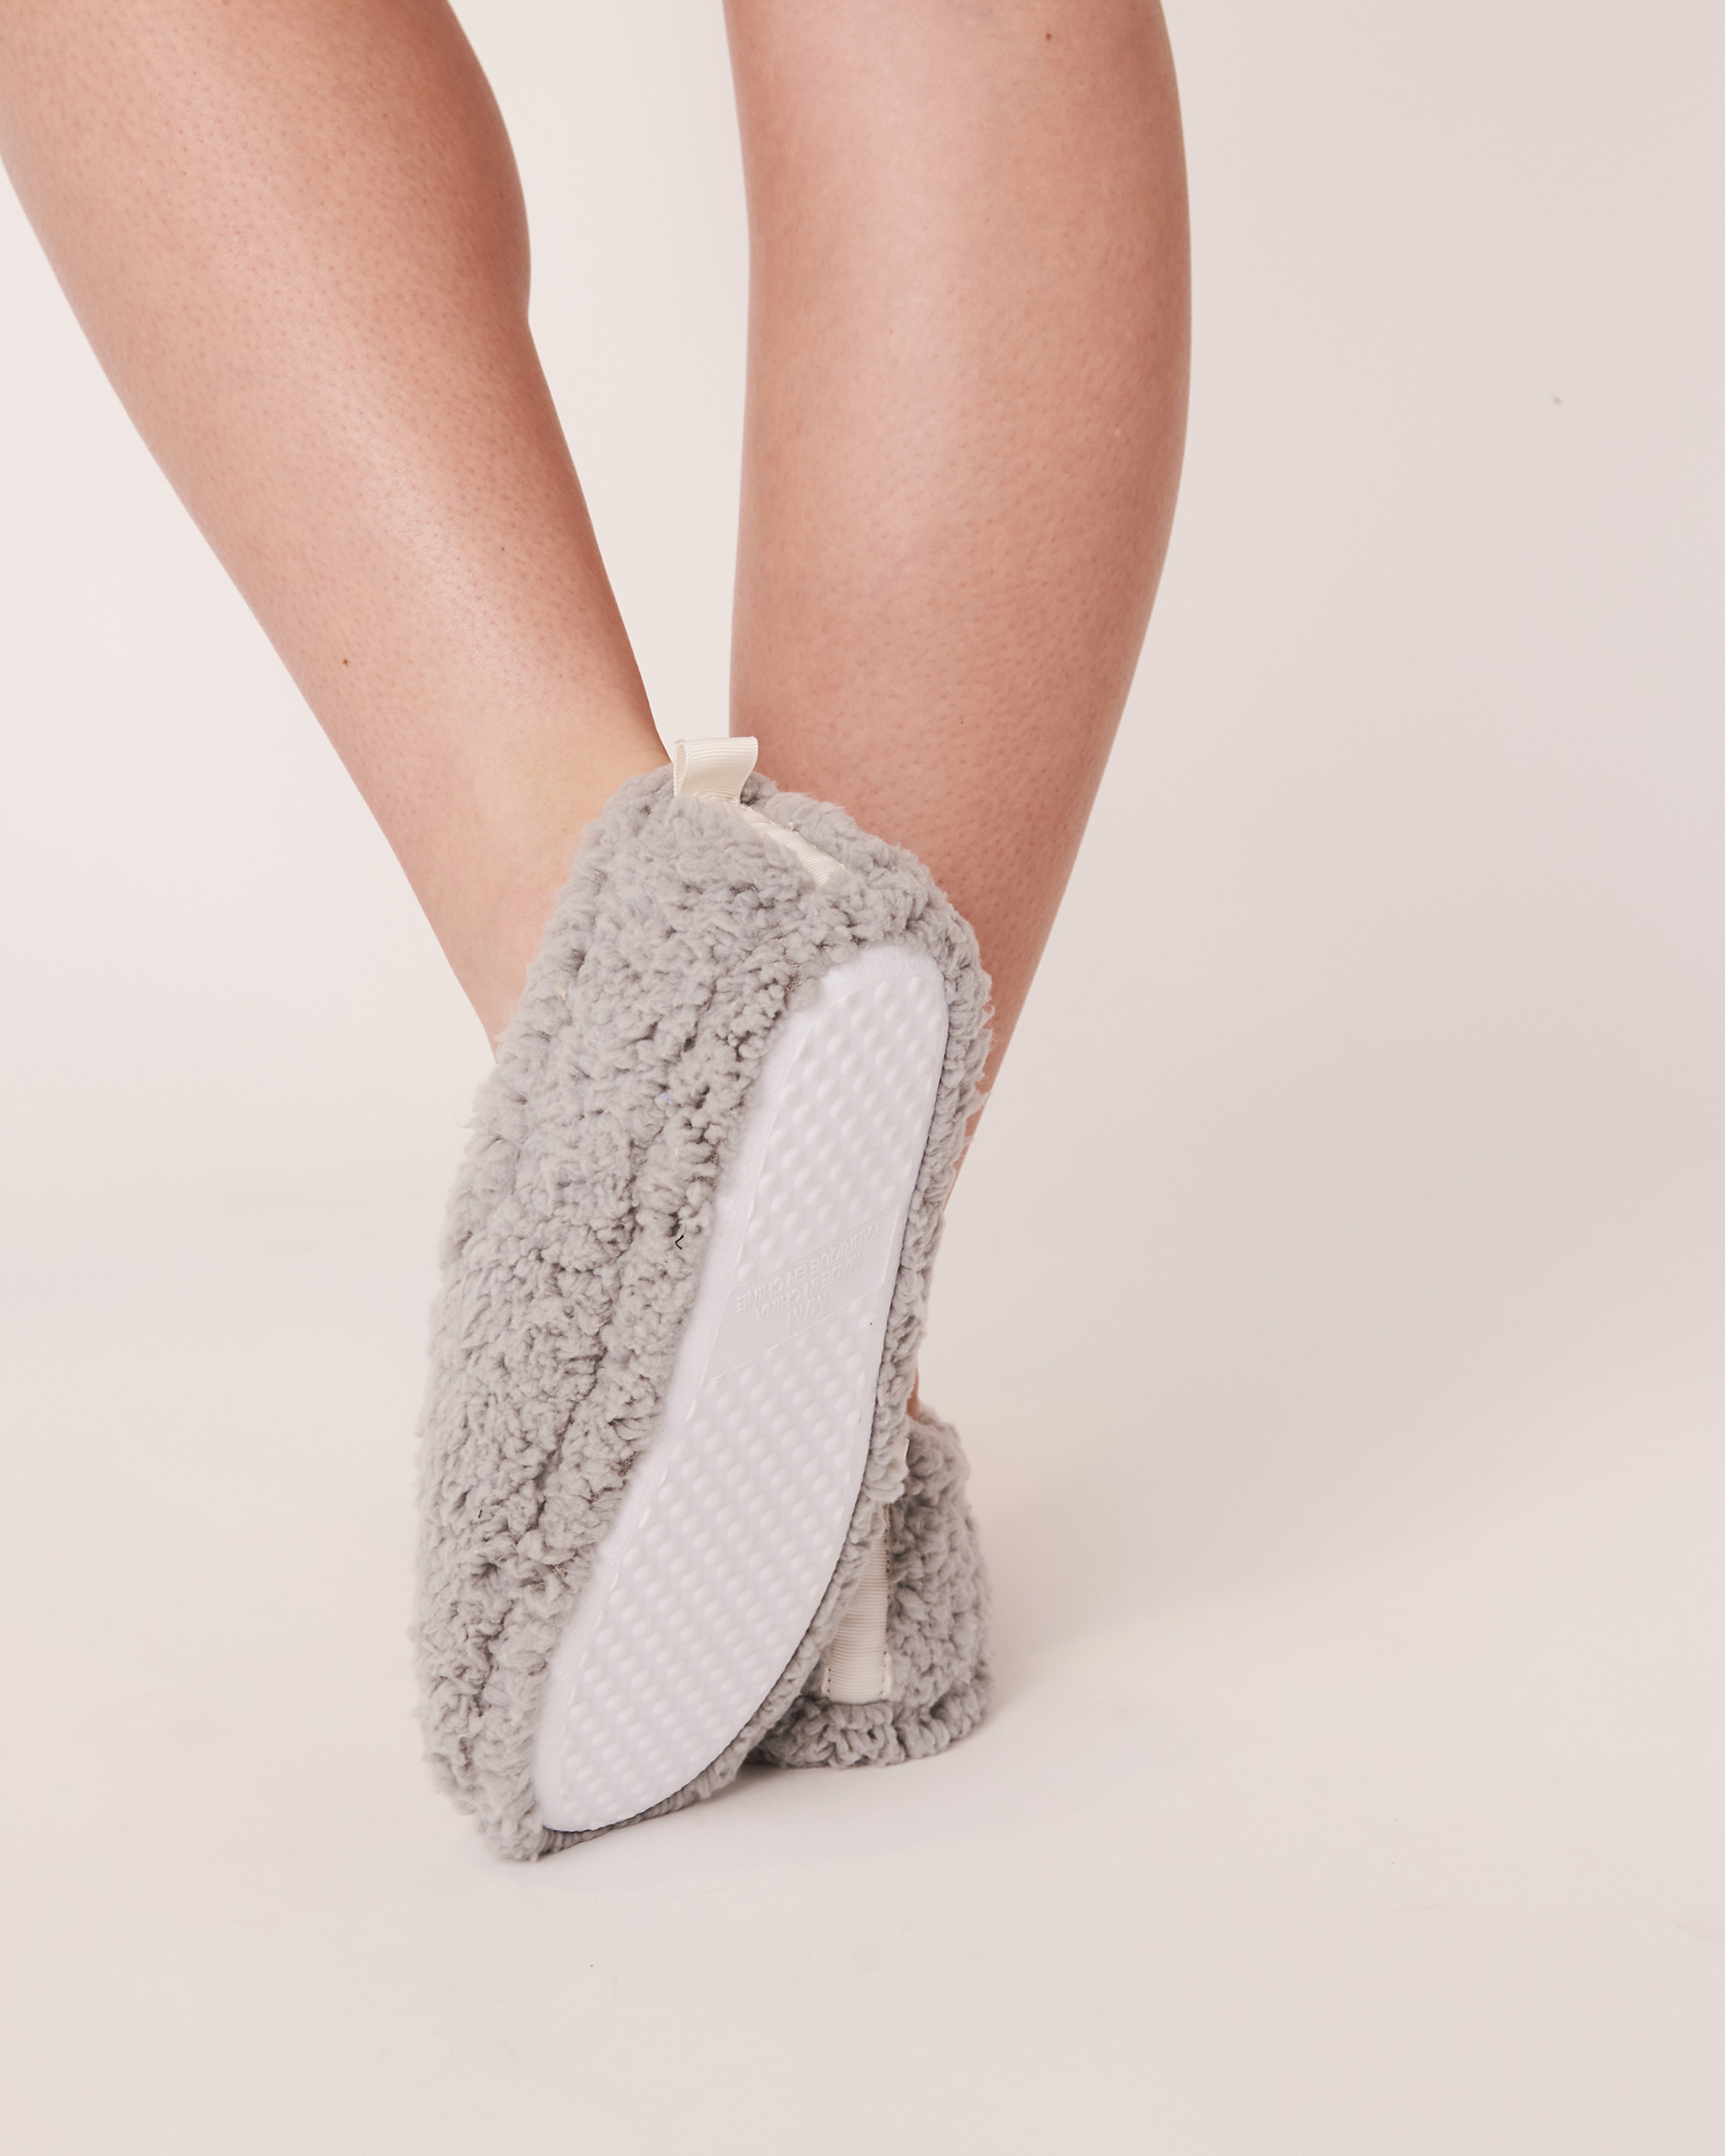 LA VIE EN ROSE Sherpa Bootie Slippers Grey 40700070 - View2